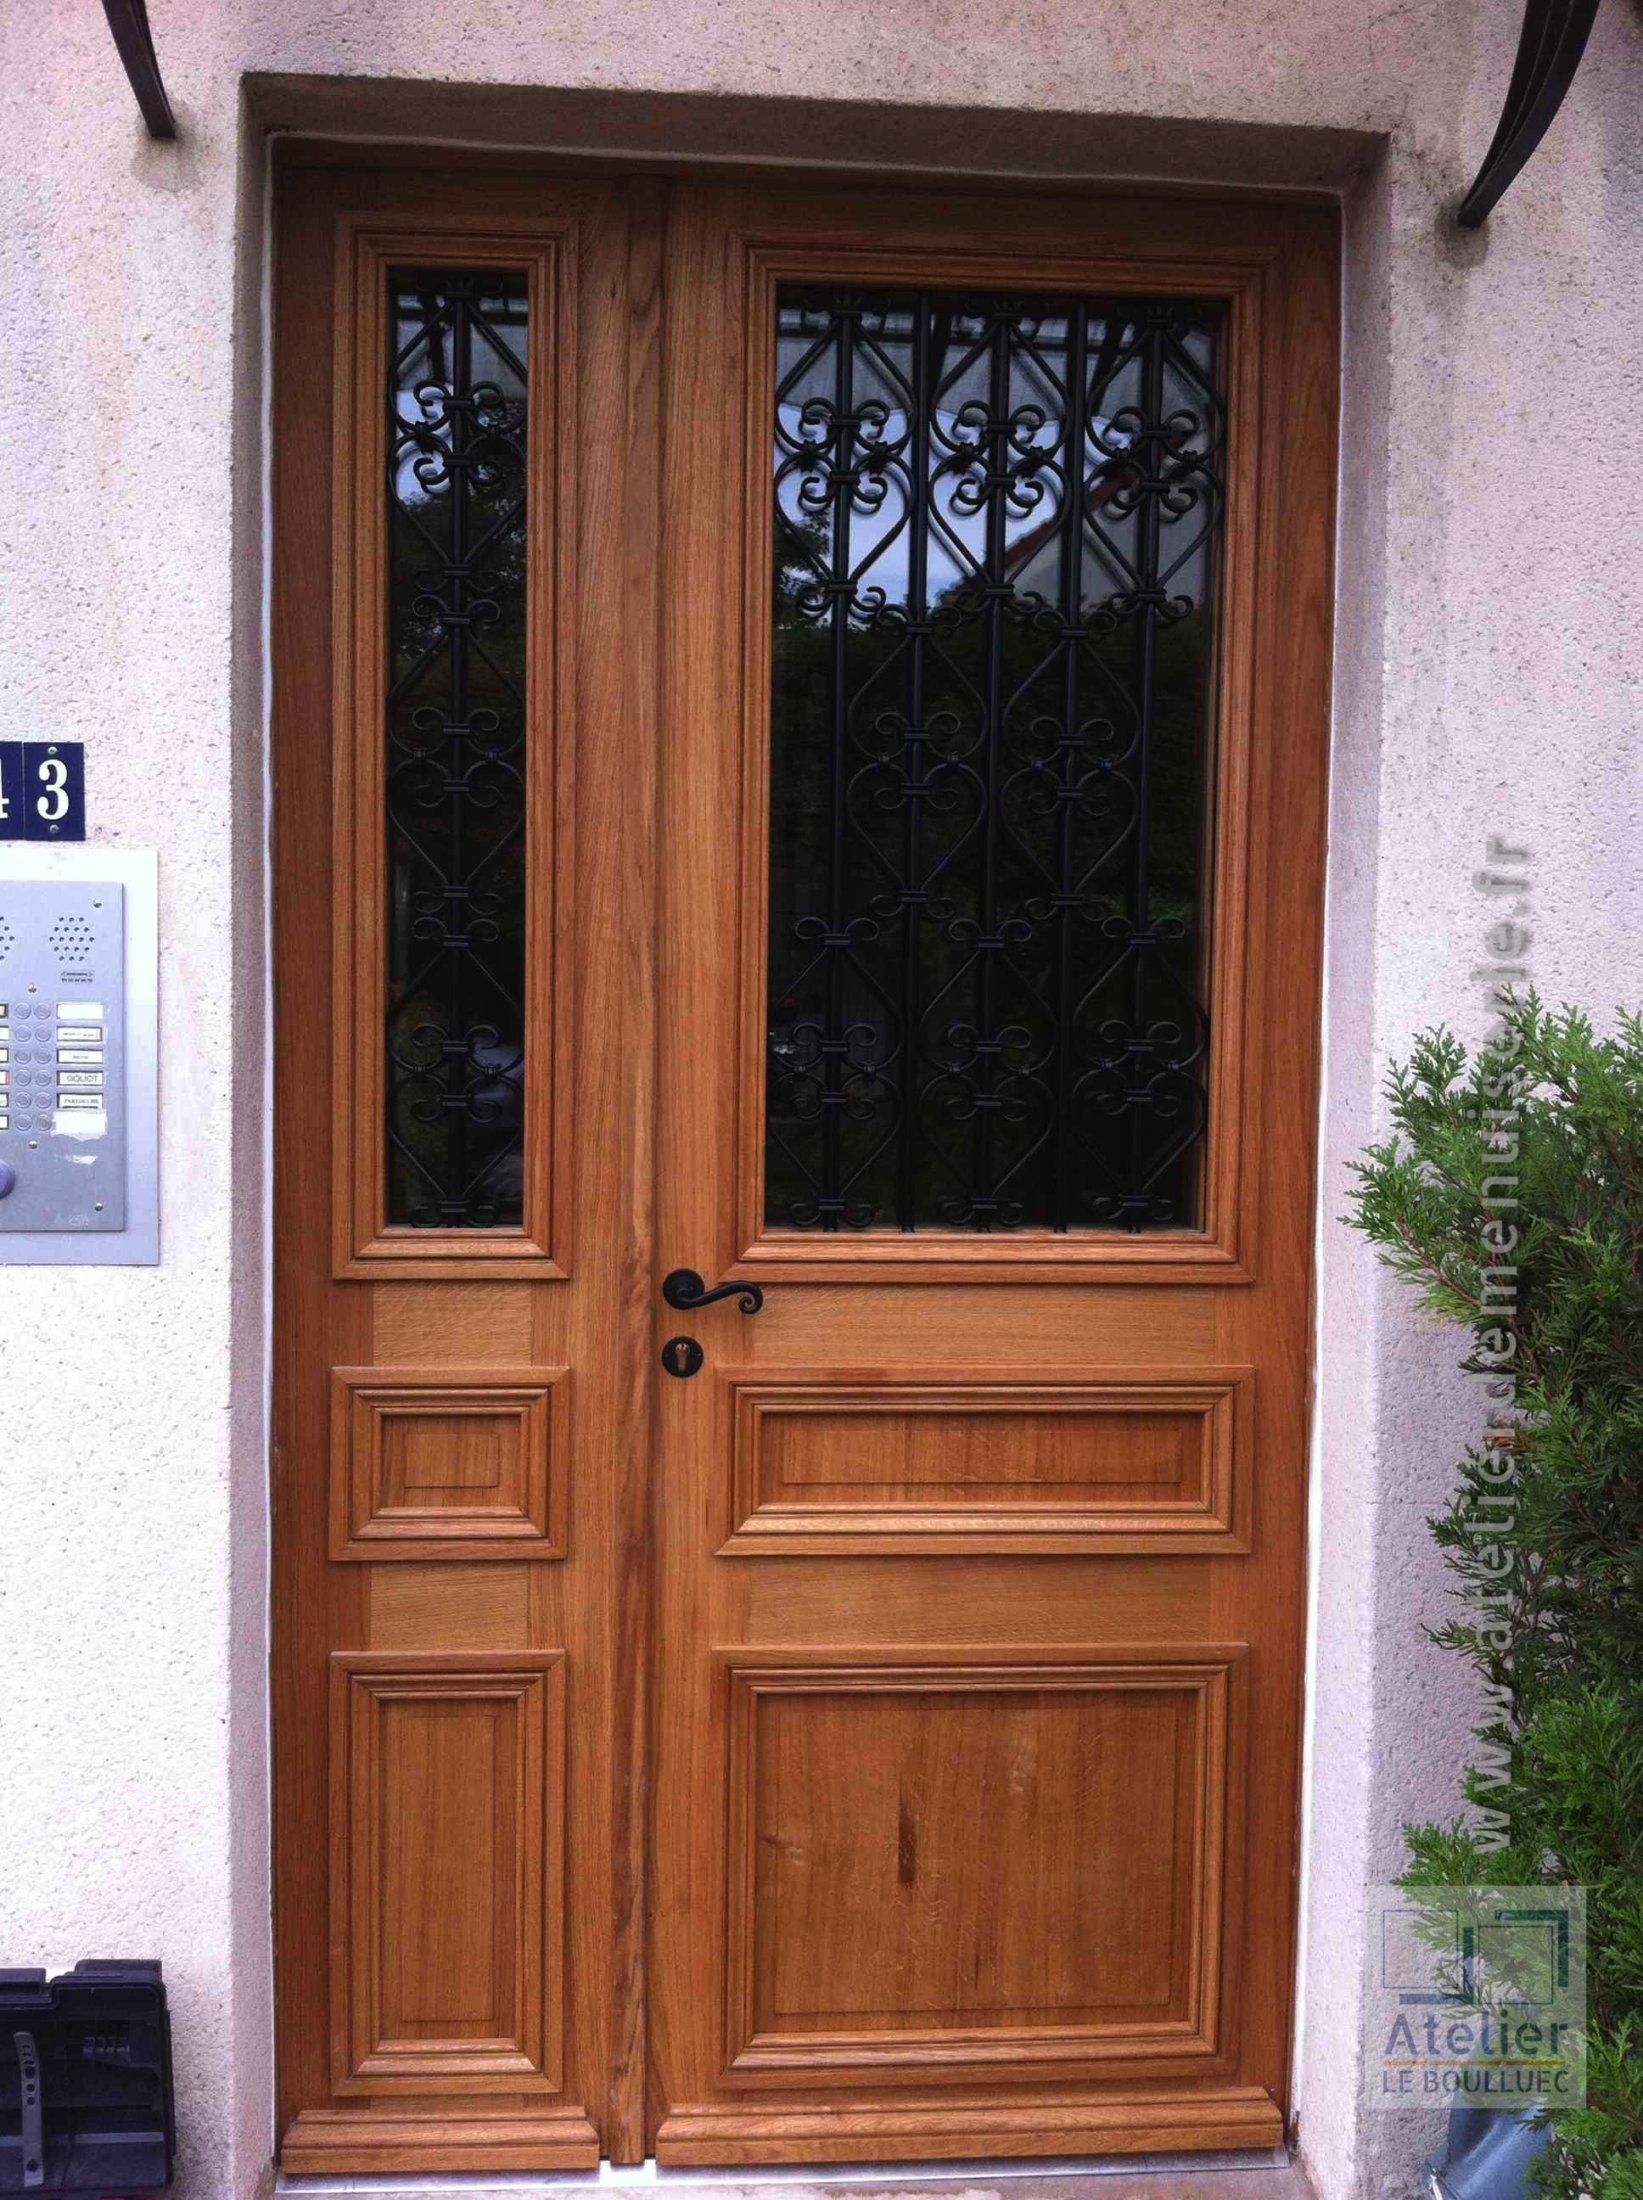 2013 02 Porte Sur Rue Corbeilller 3 Tiercée Chêne Avec Grilles